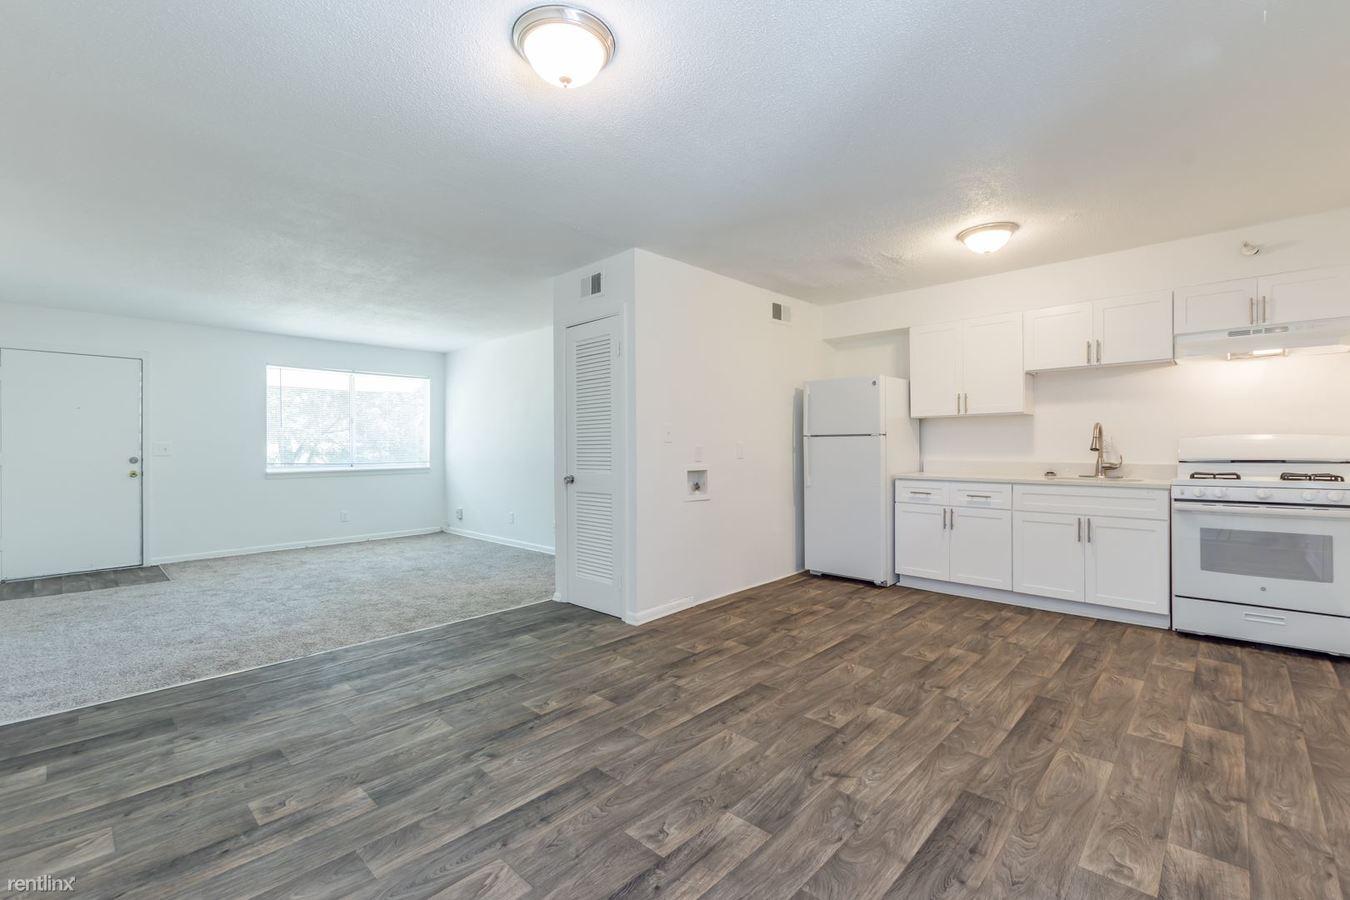 1 Bedroom 1 Bathroom Apartment for rent at Valley Bridge Apartments in Decatur, GA